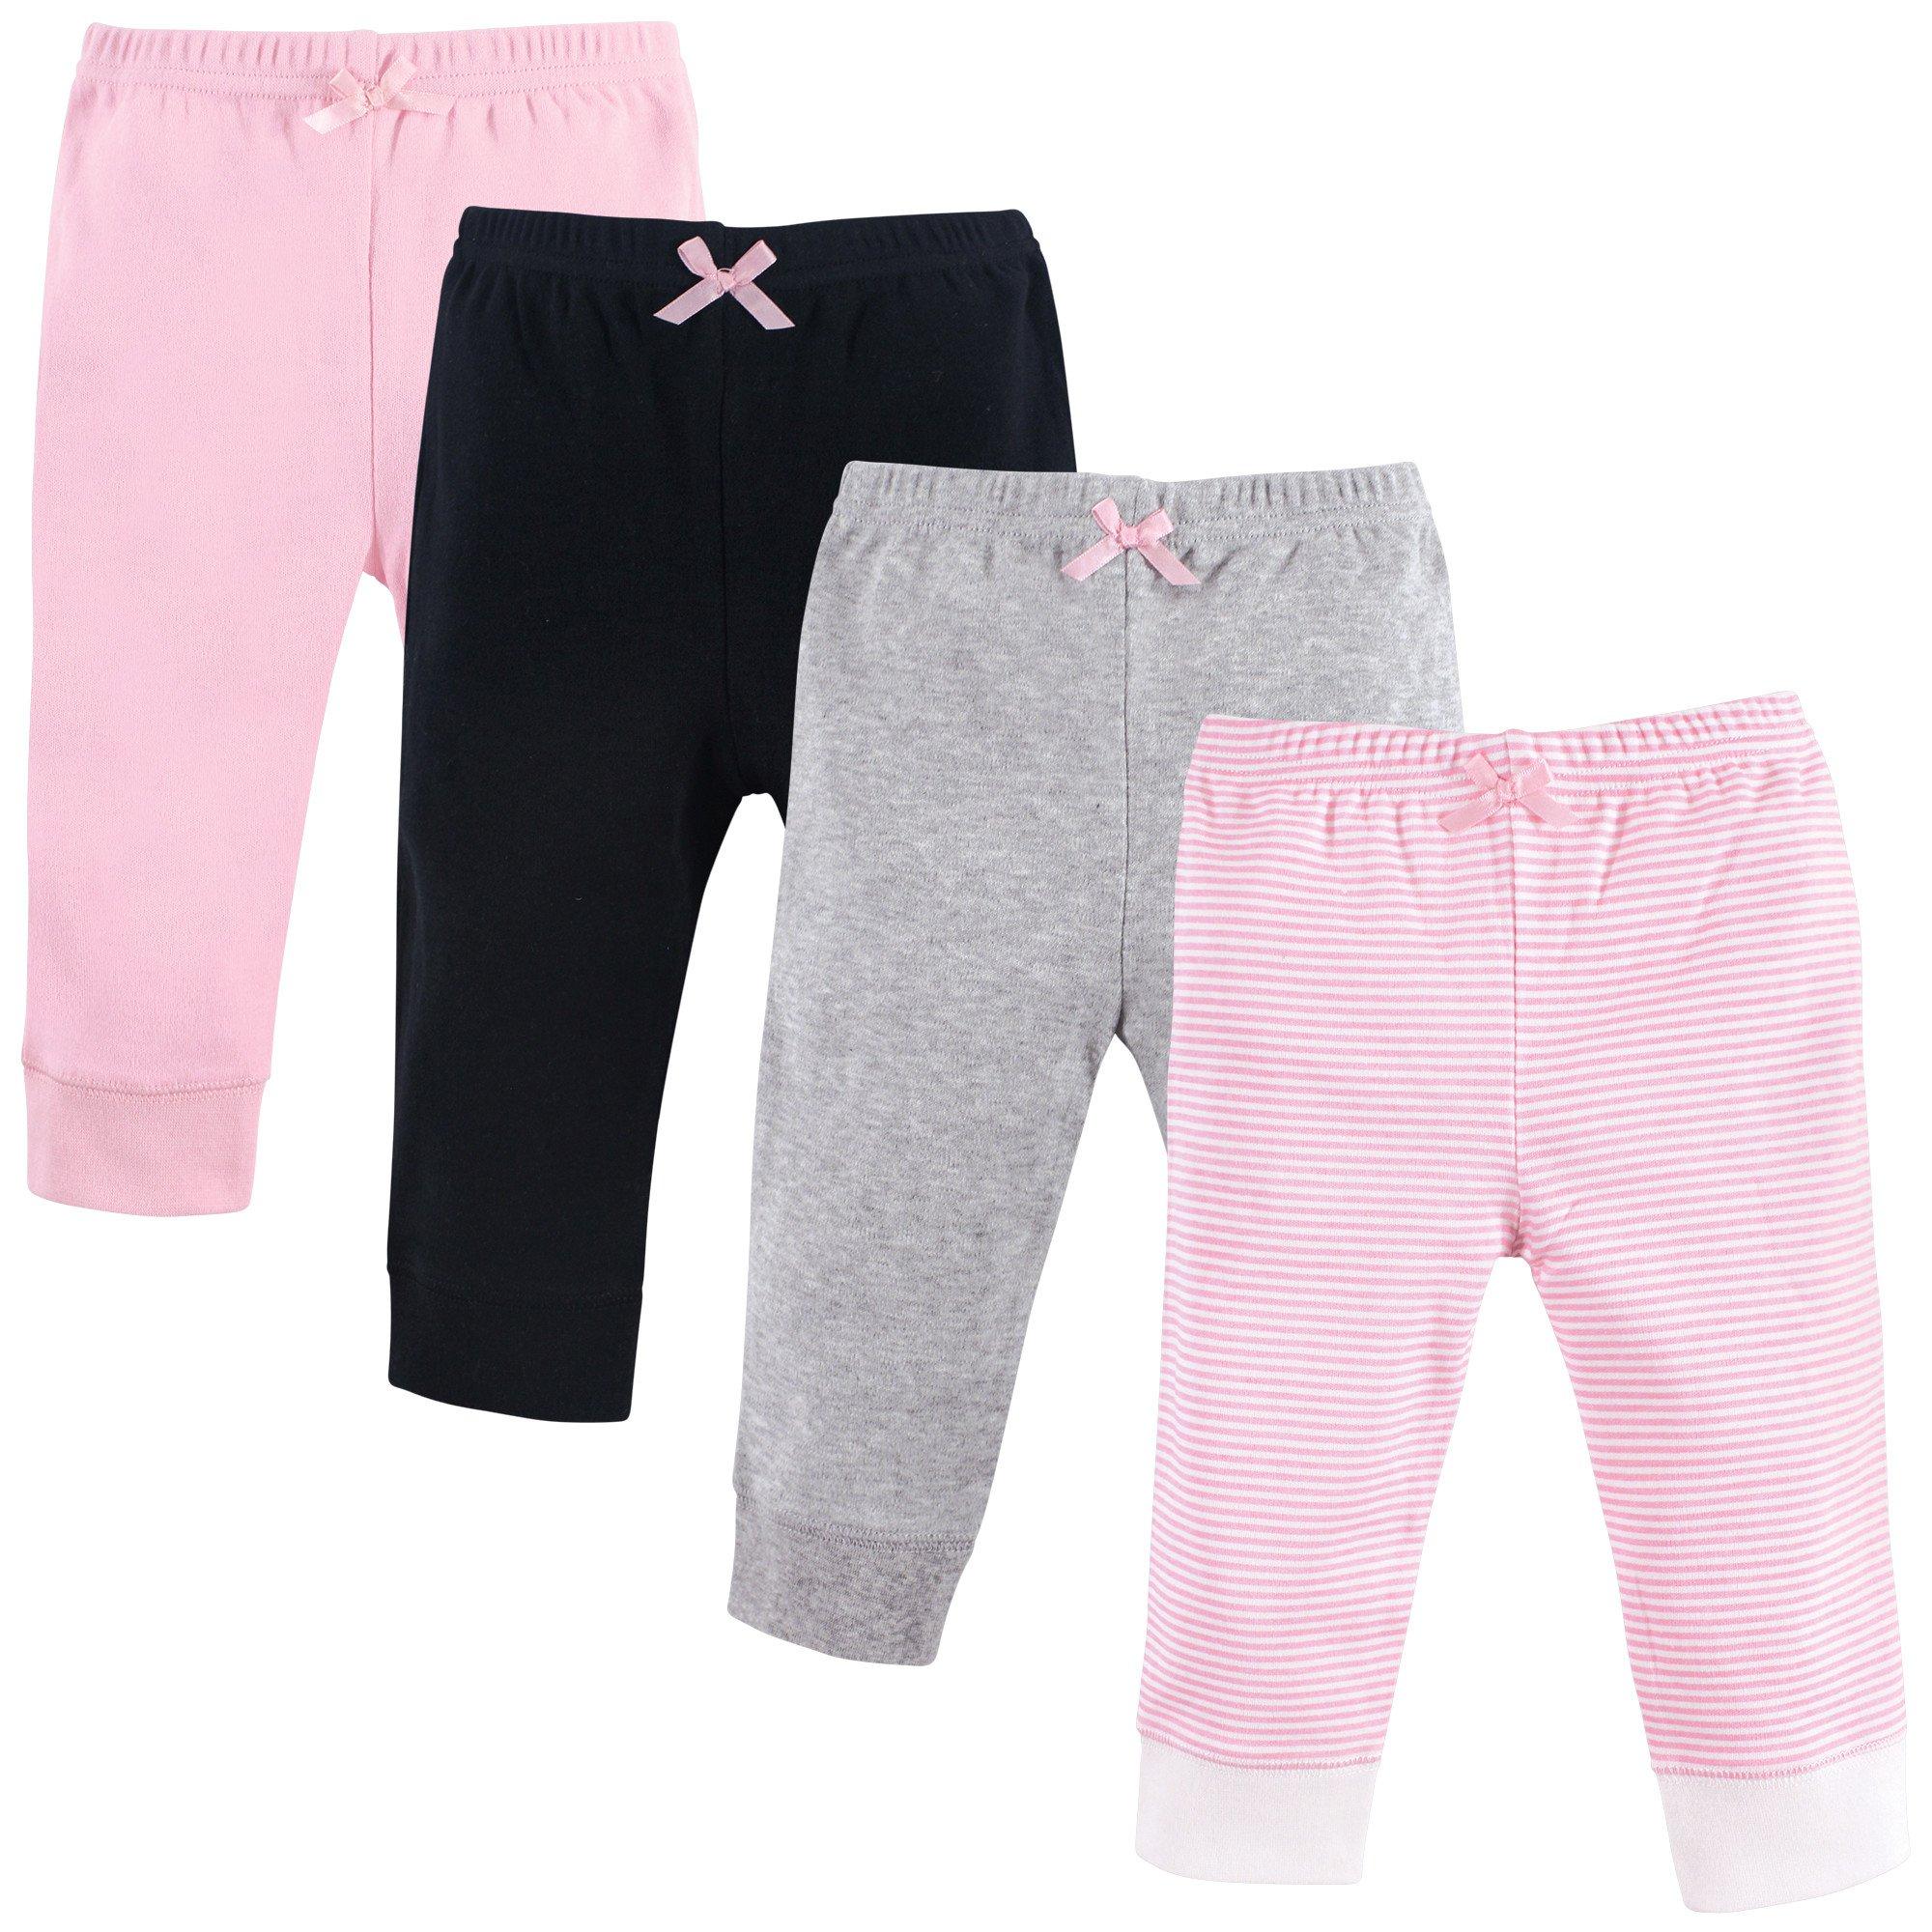 Luvable Friends Baby Cotton Pants, Lt. Pink Stripe 4-Pack, 9-12 Months (12M) by Luvable Friends